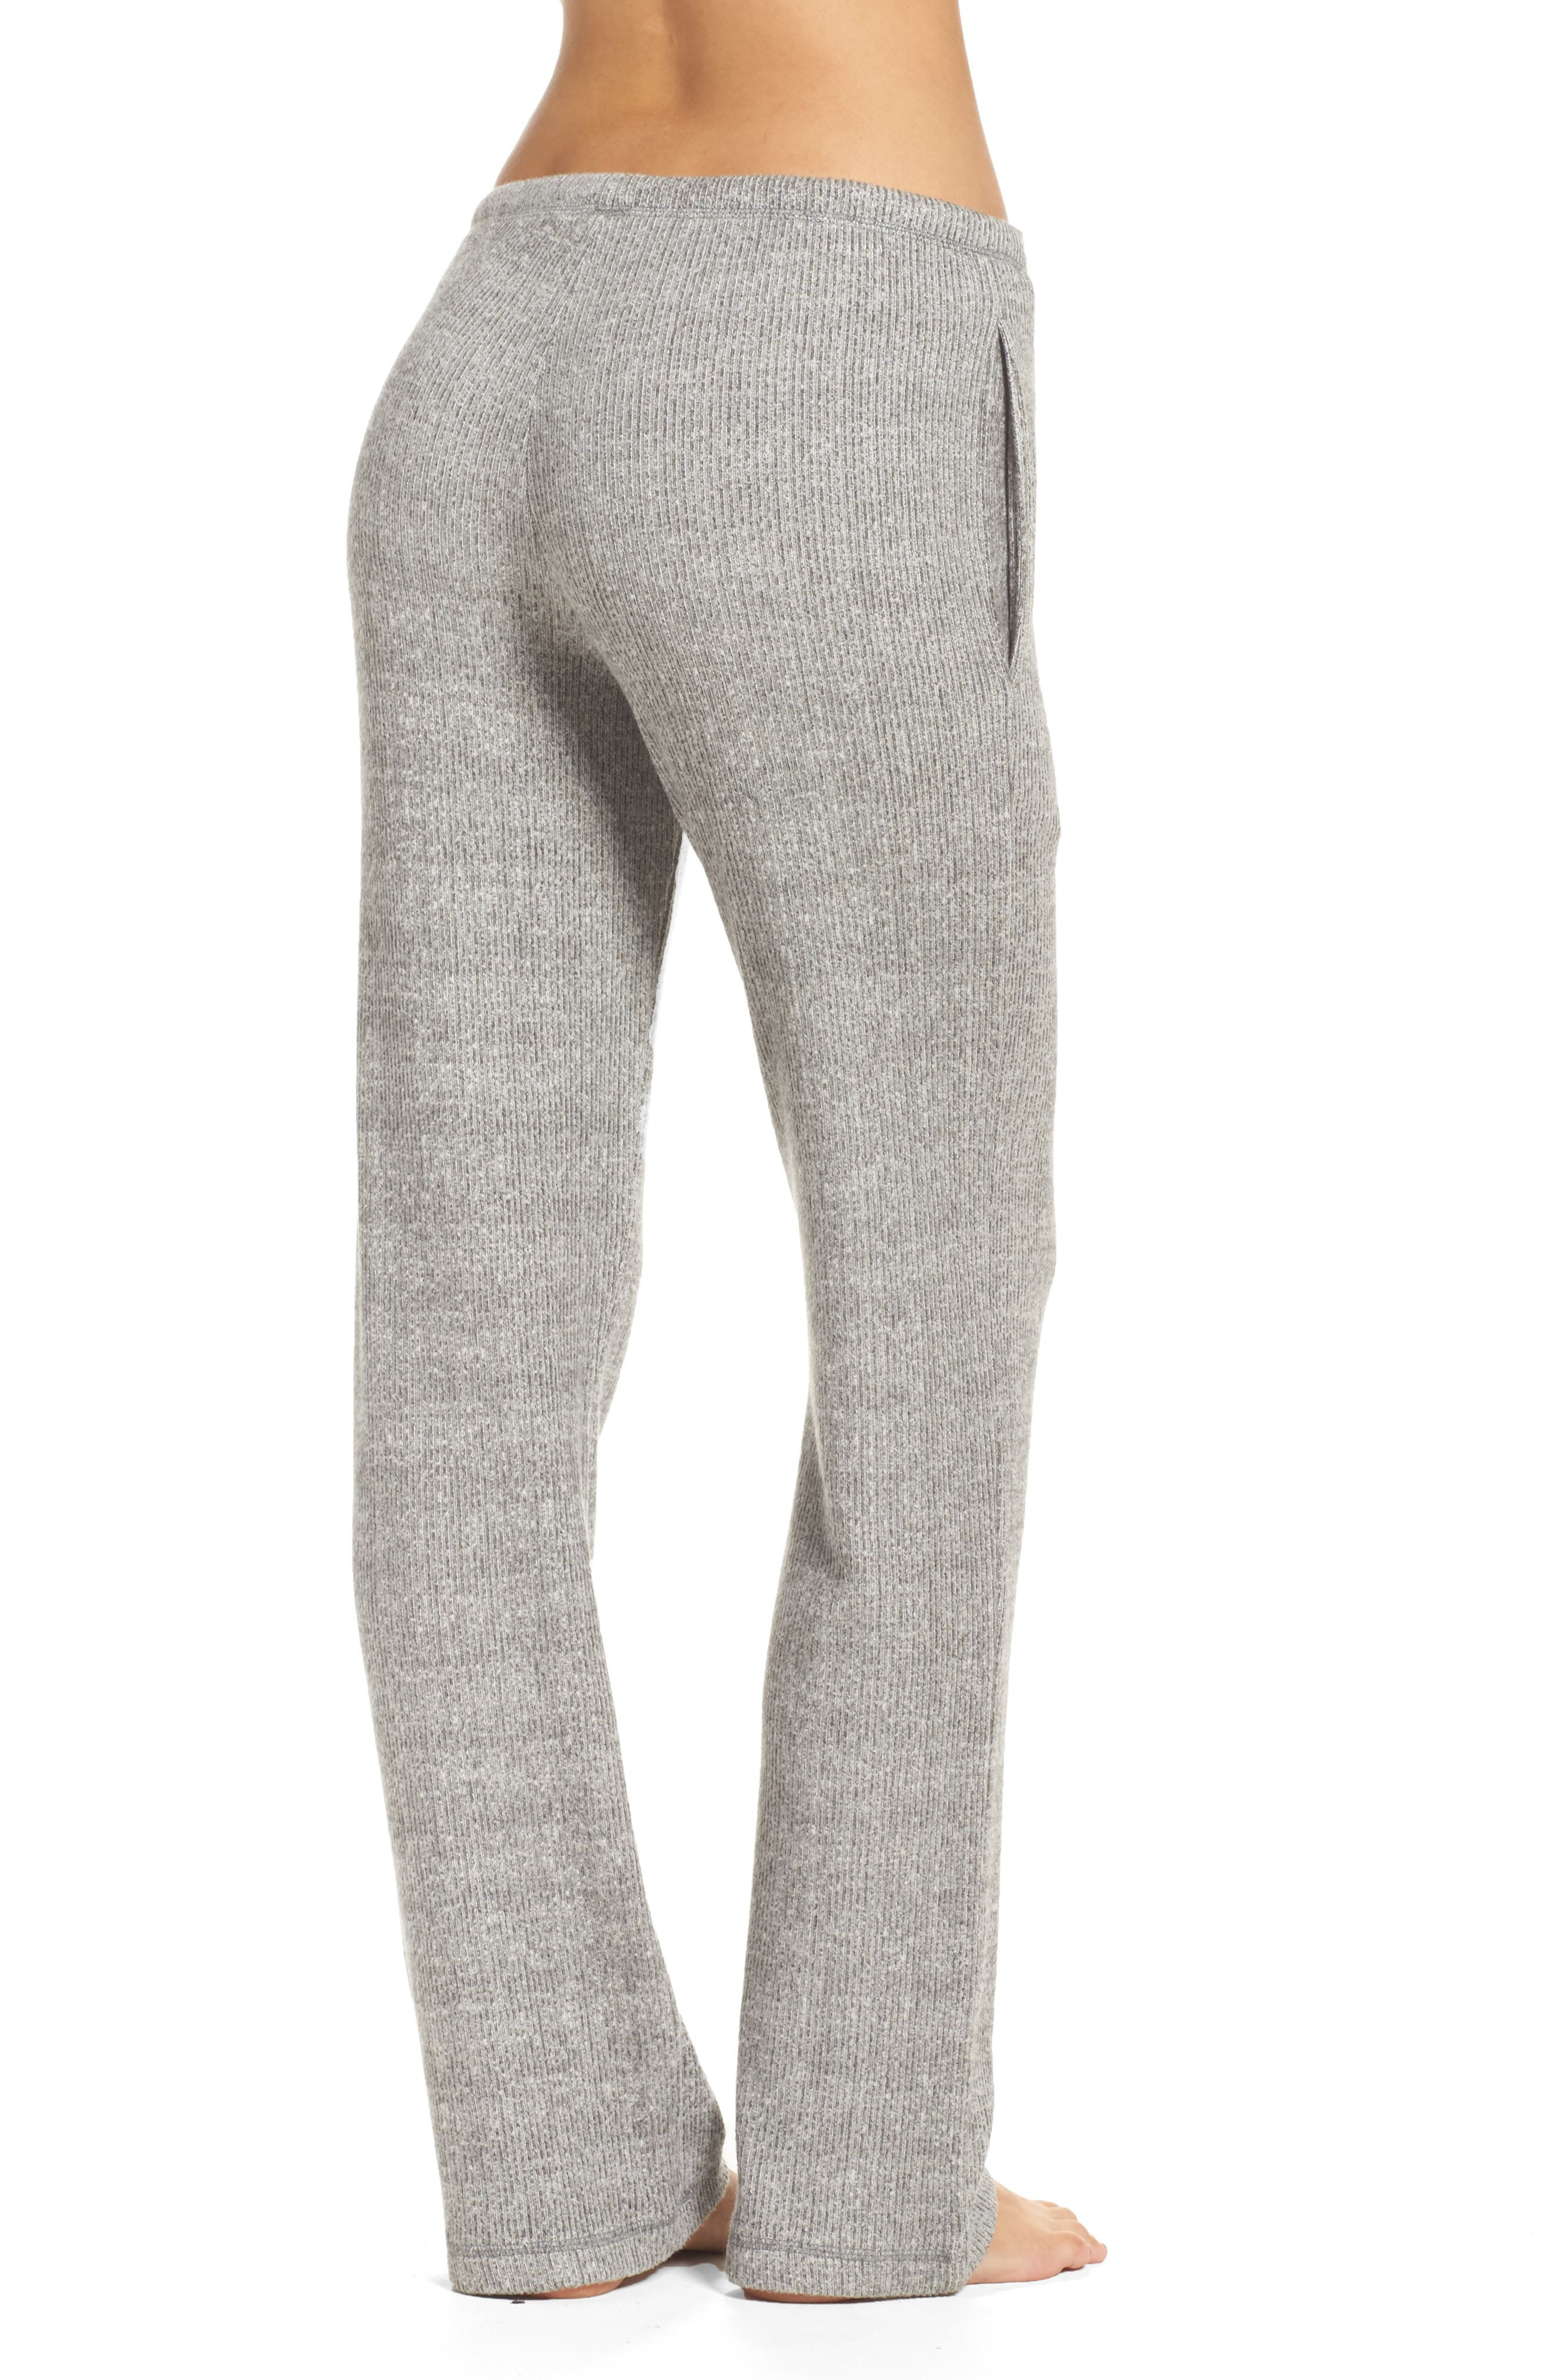 Knit Lounge Pants,                             Alternate thumbnail 2, color,                             Grey